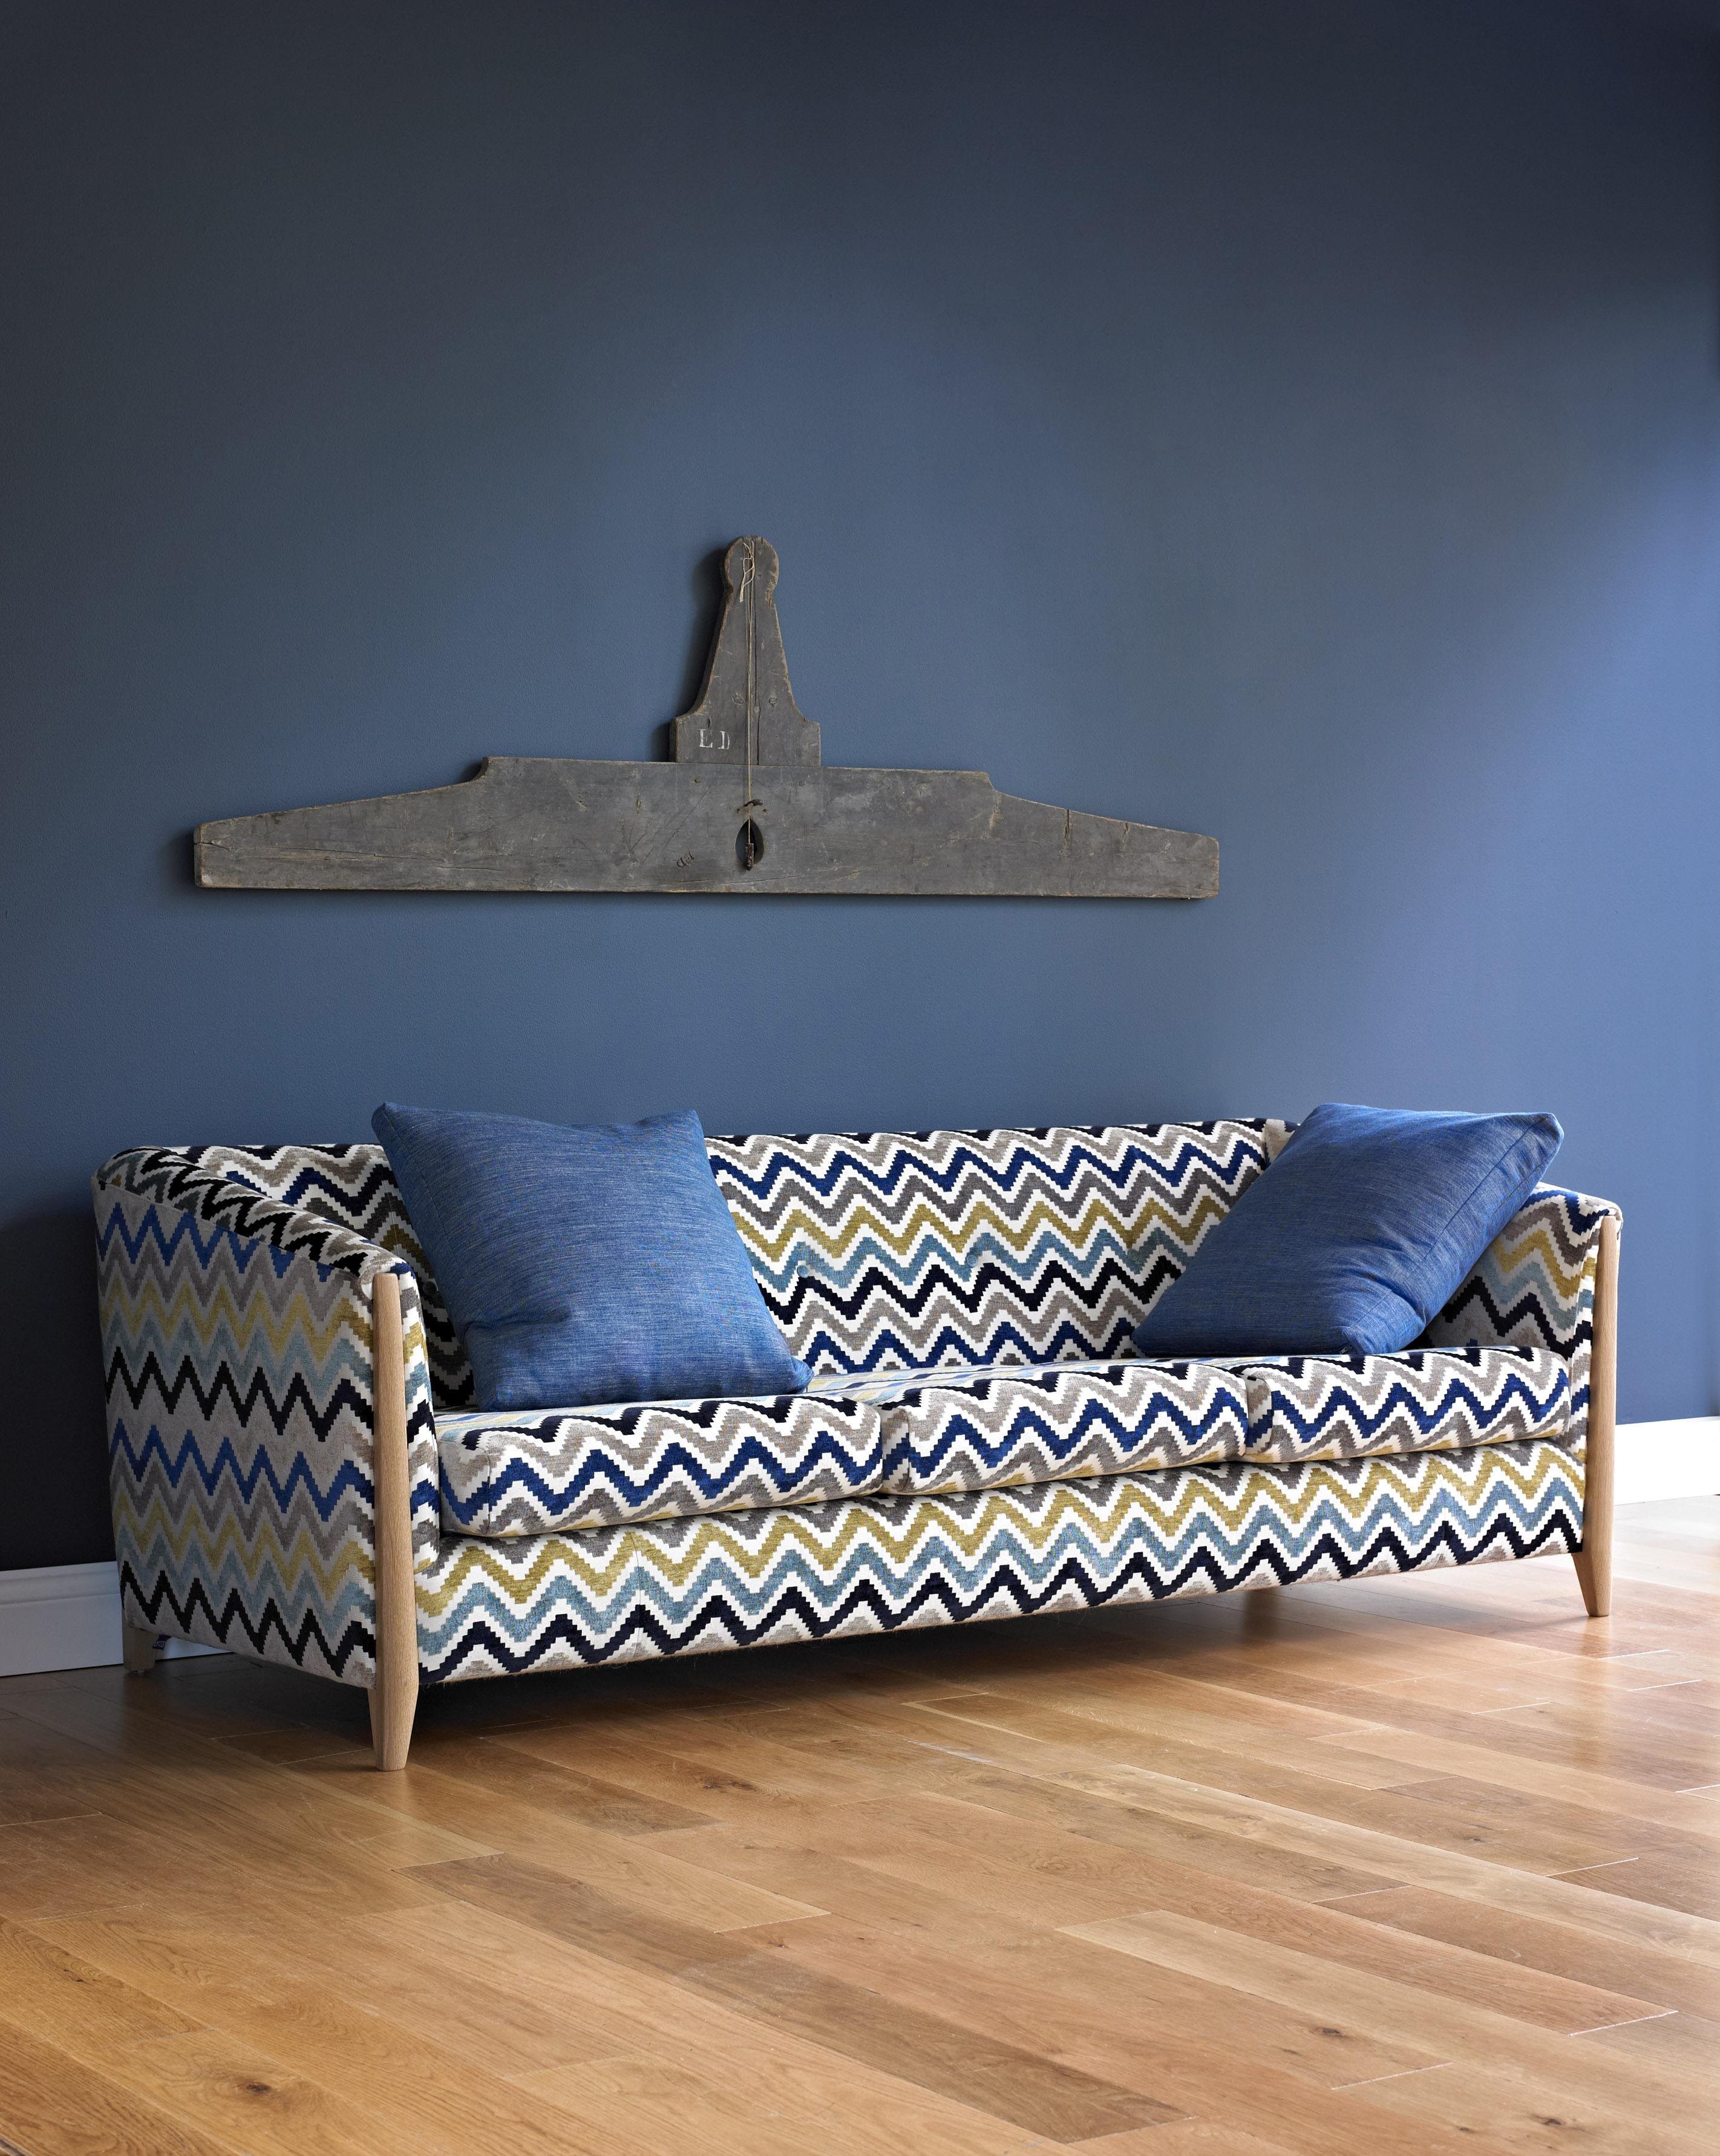 svelto straight sofa 3 seaters l 215 cm multicolore by. Black Bedroom Furniture Sets. Home Design Ideas